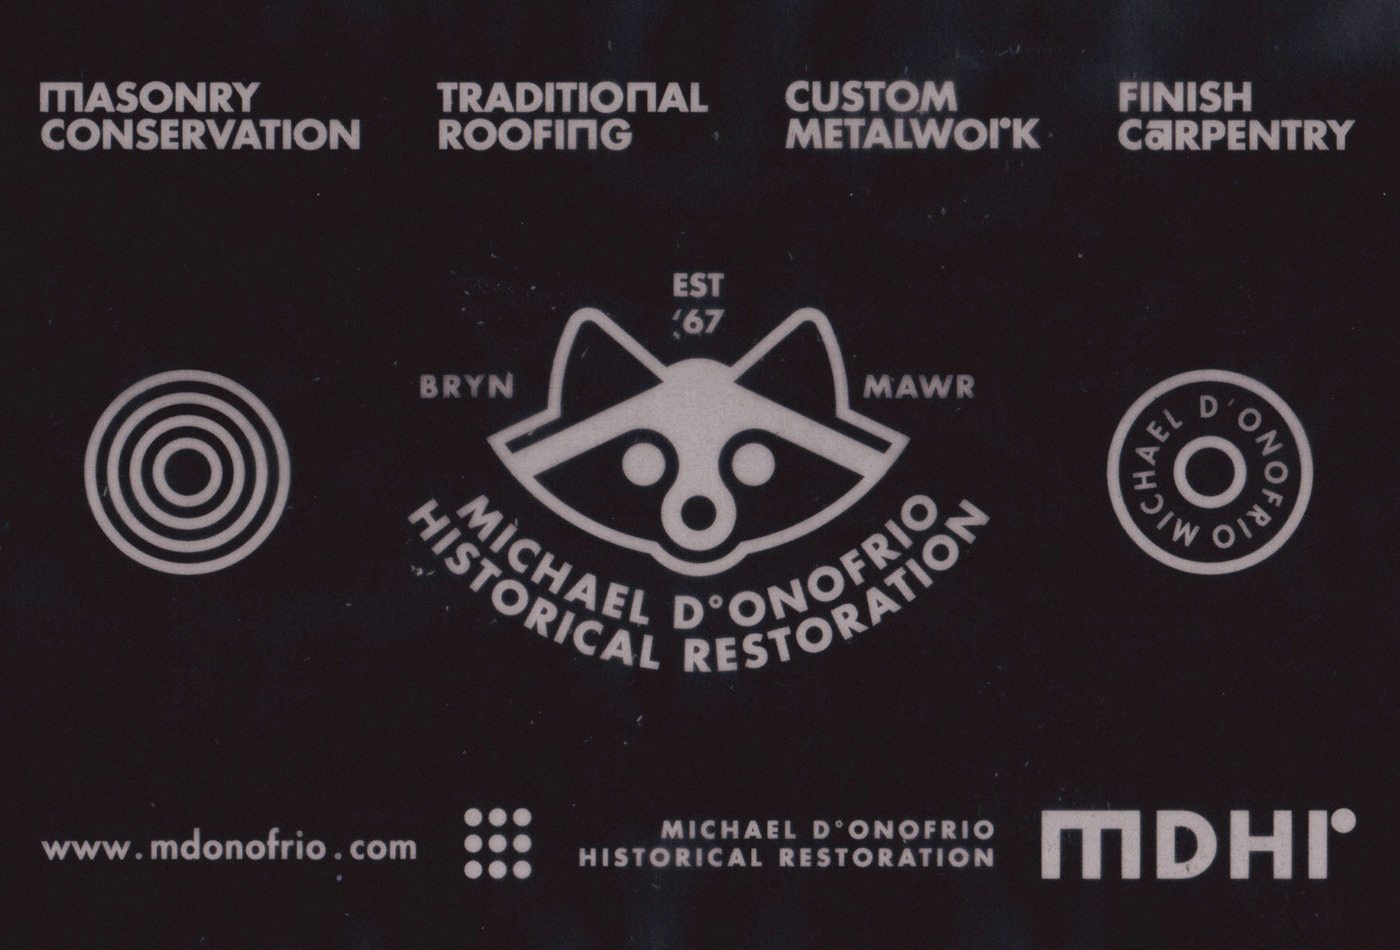 MICHAEL D°ONOFRIO HISTORICAL RESTORATION on